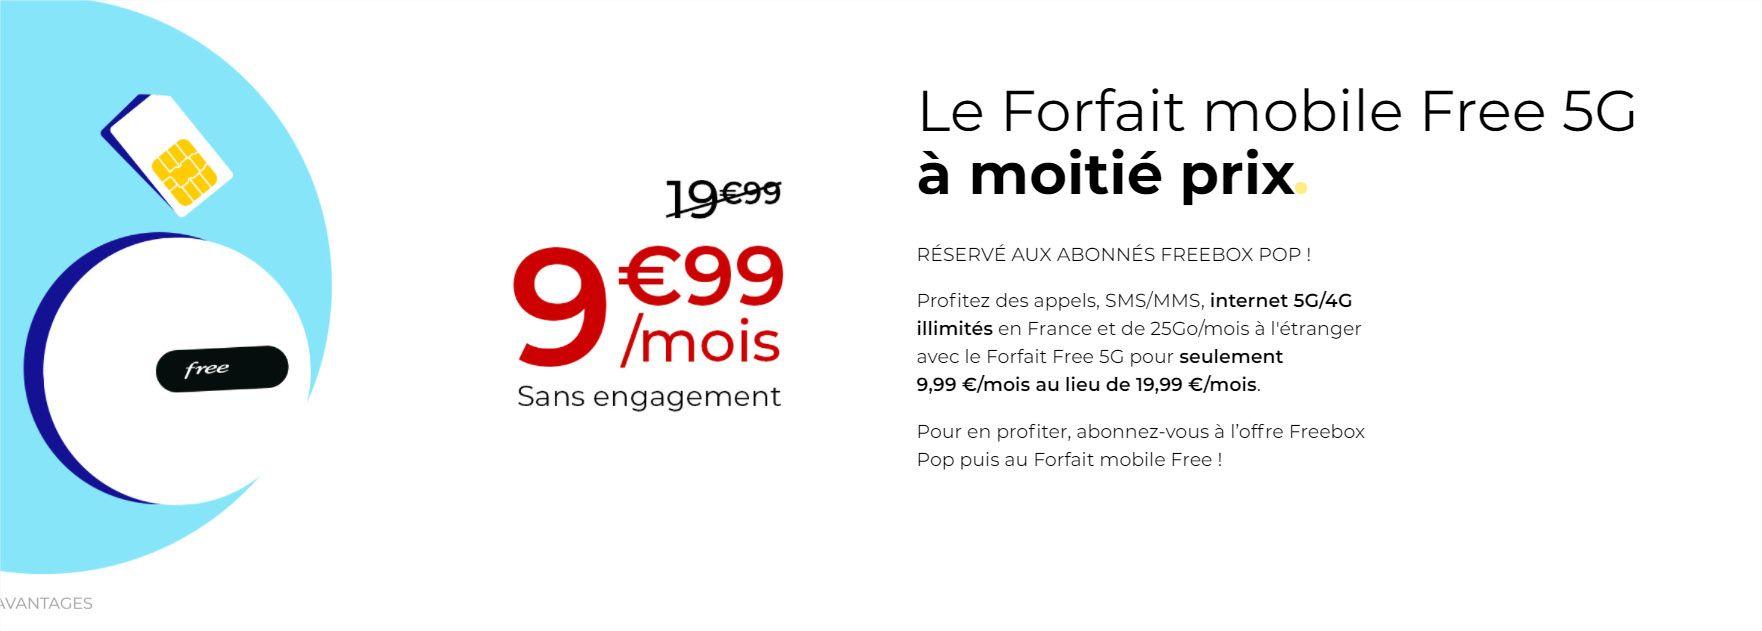 free mobile pop